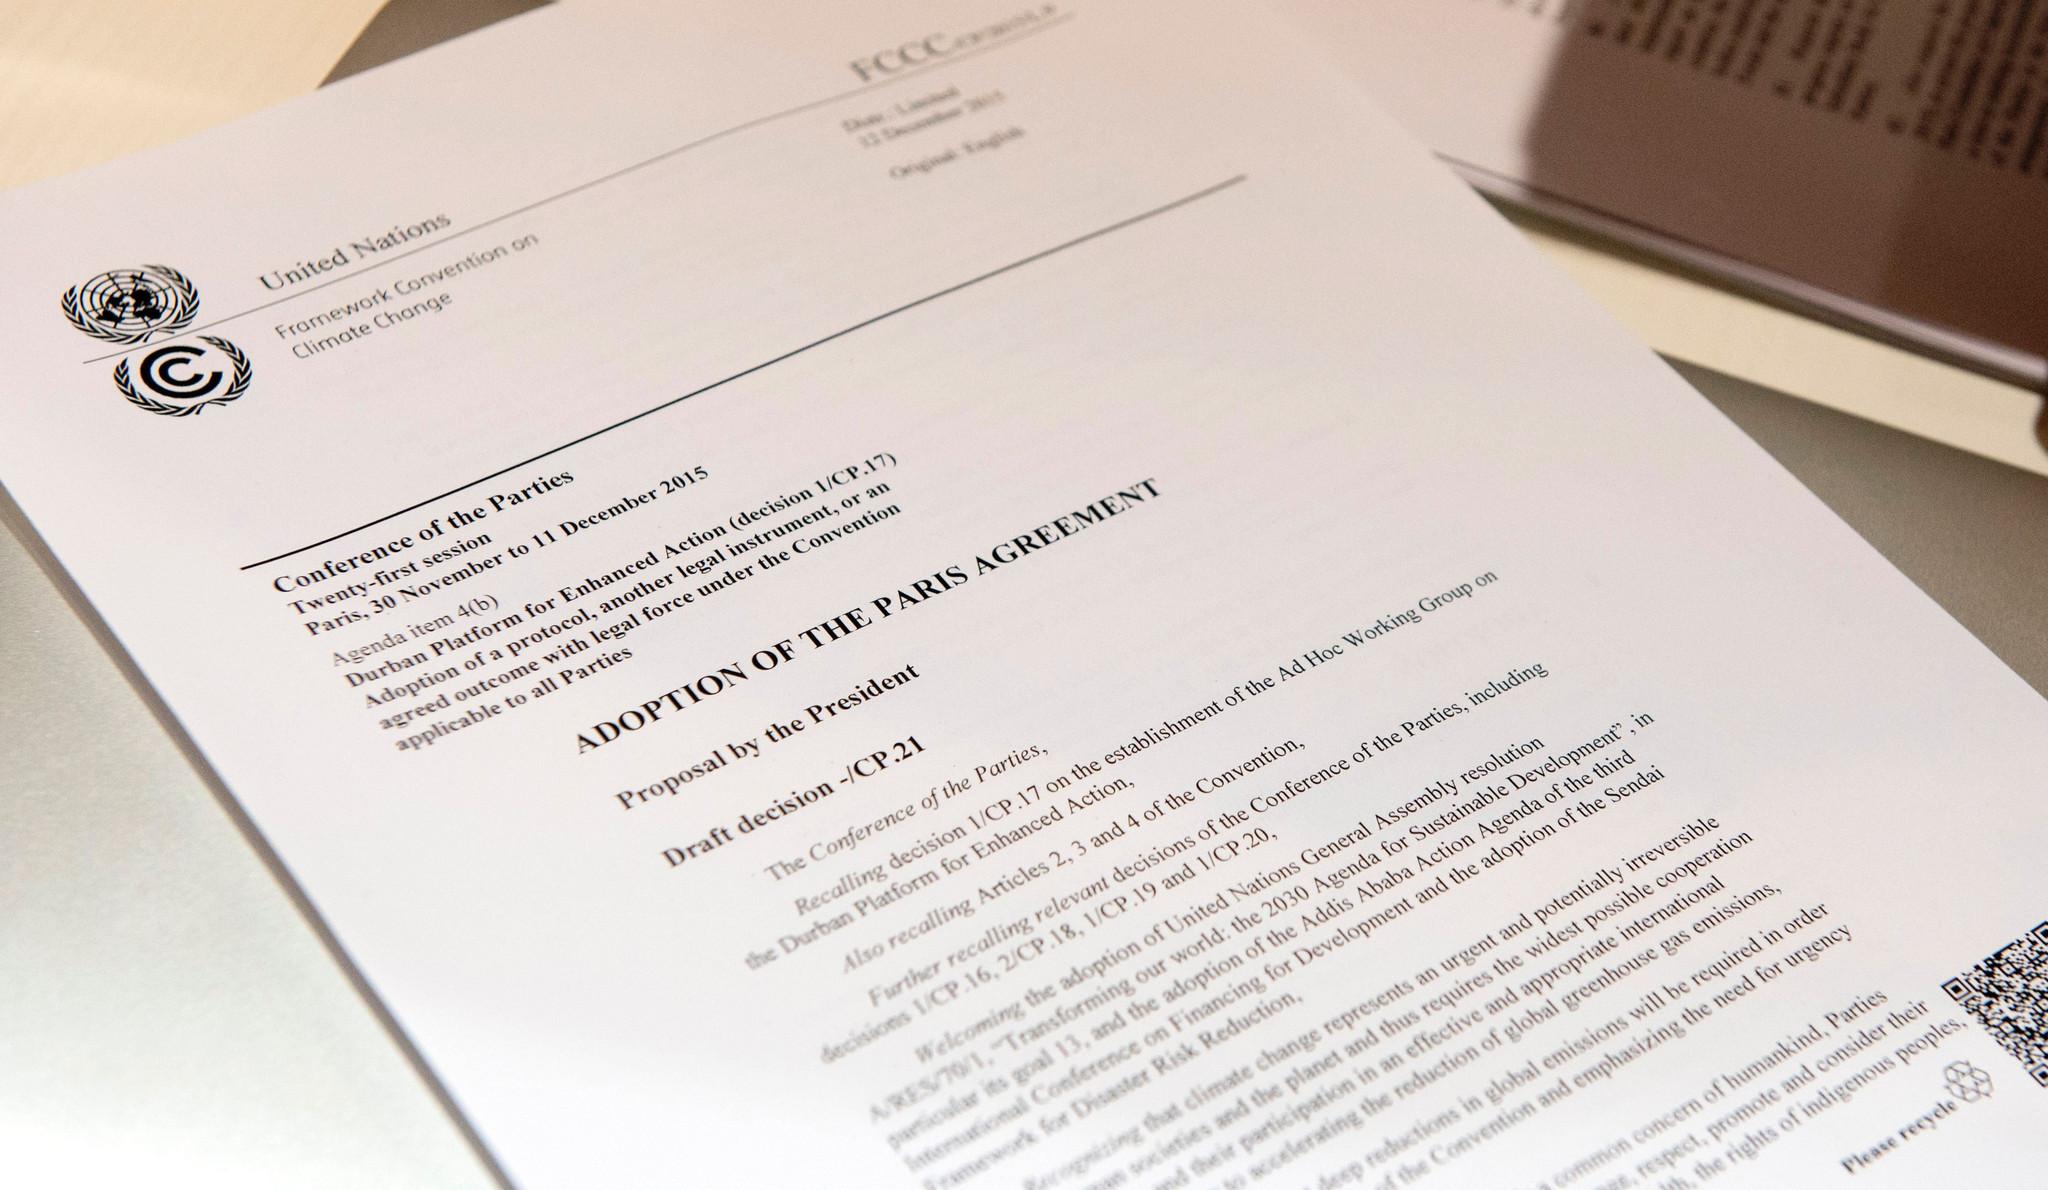 Key points of the landmark Paris agreement